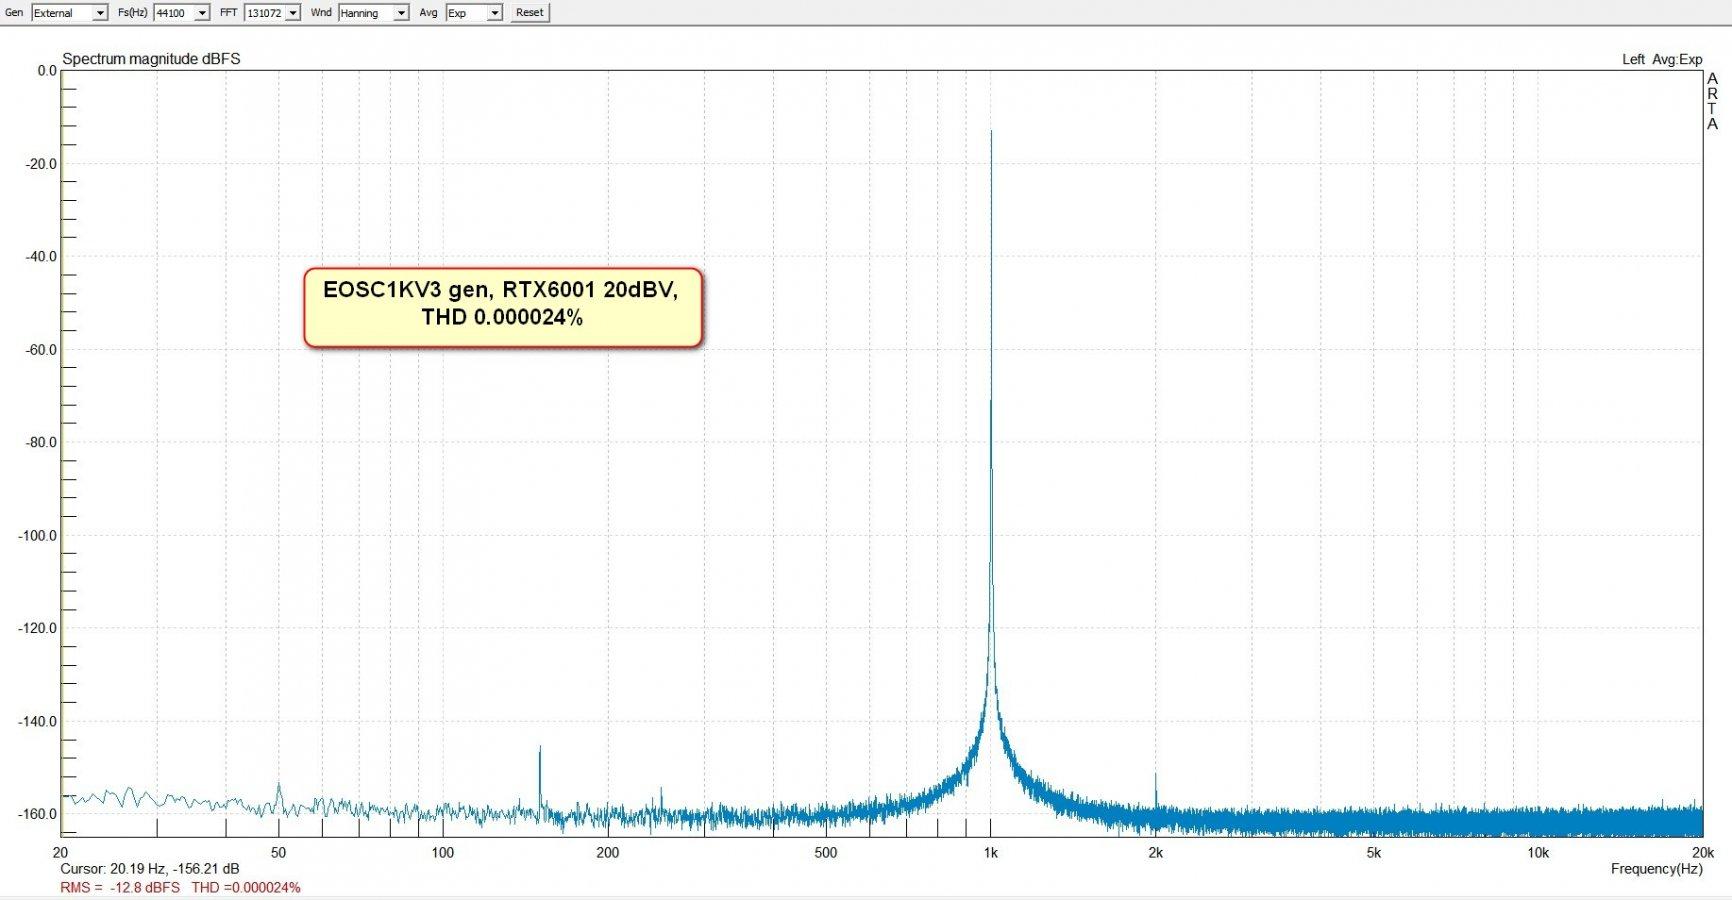 EOSC1KV3 gen, RTX6001 20dBV, THD 0.000024%.jpg